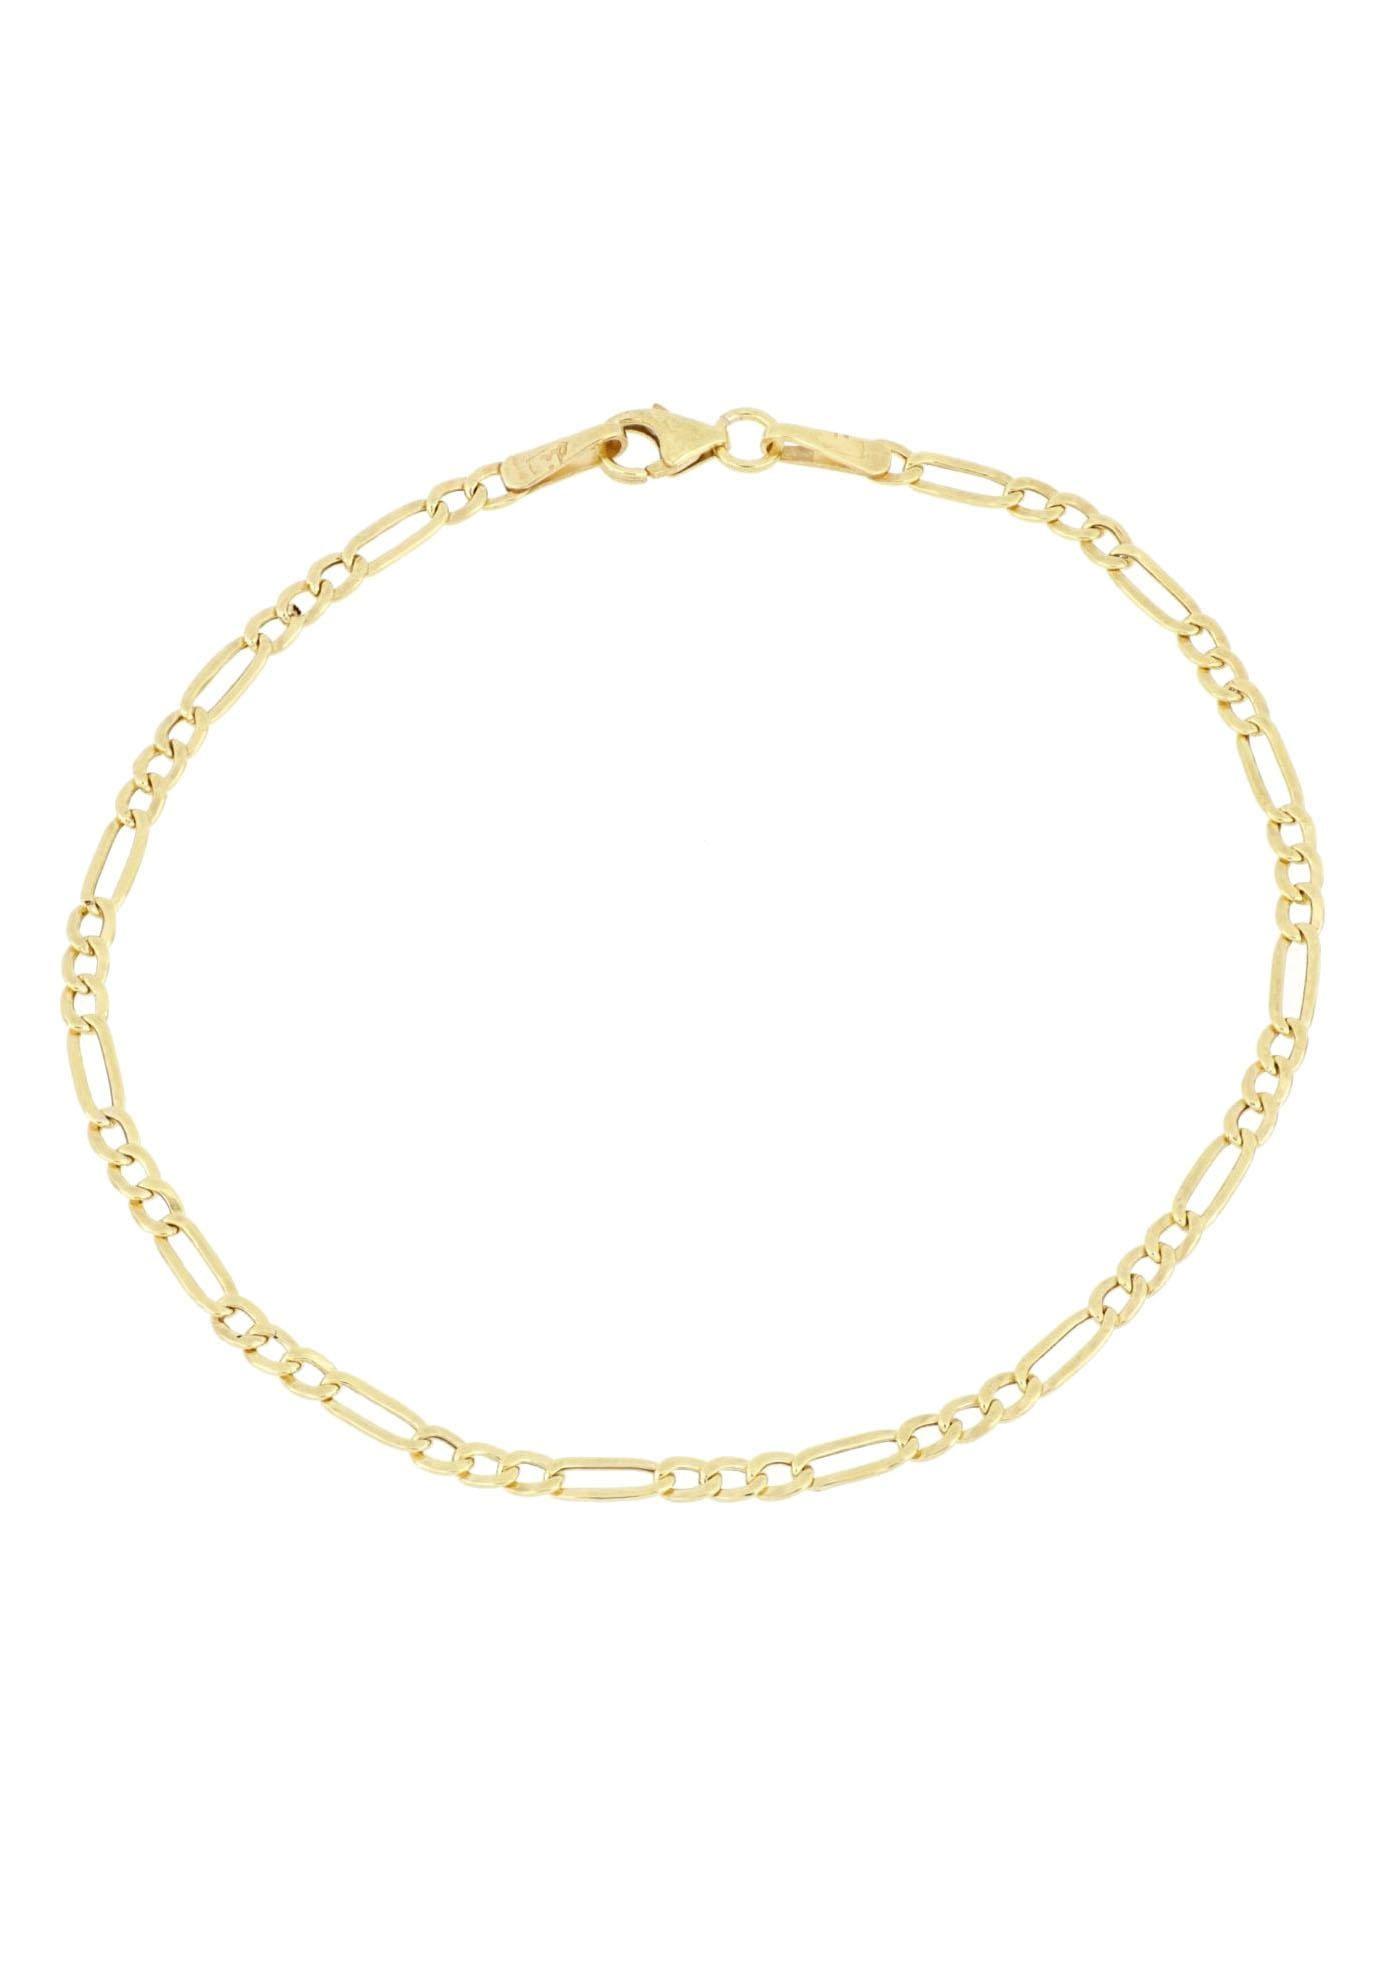 Firetti Goldarmband »in Figarokettengliederung, 2-fach diamantiert, poliert«   Schmuck > Armbänder > Goldarmbänder   FIRETTI